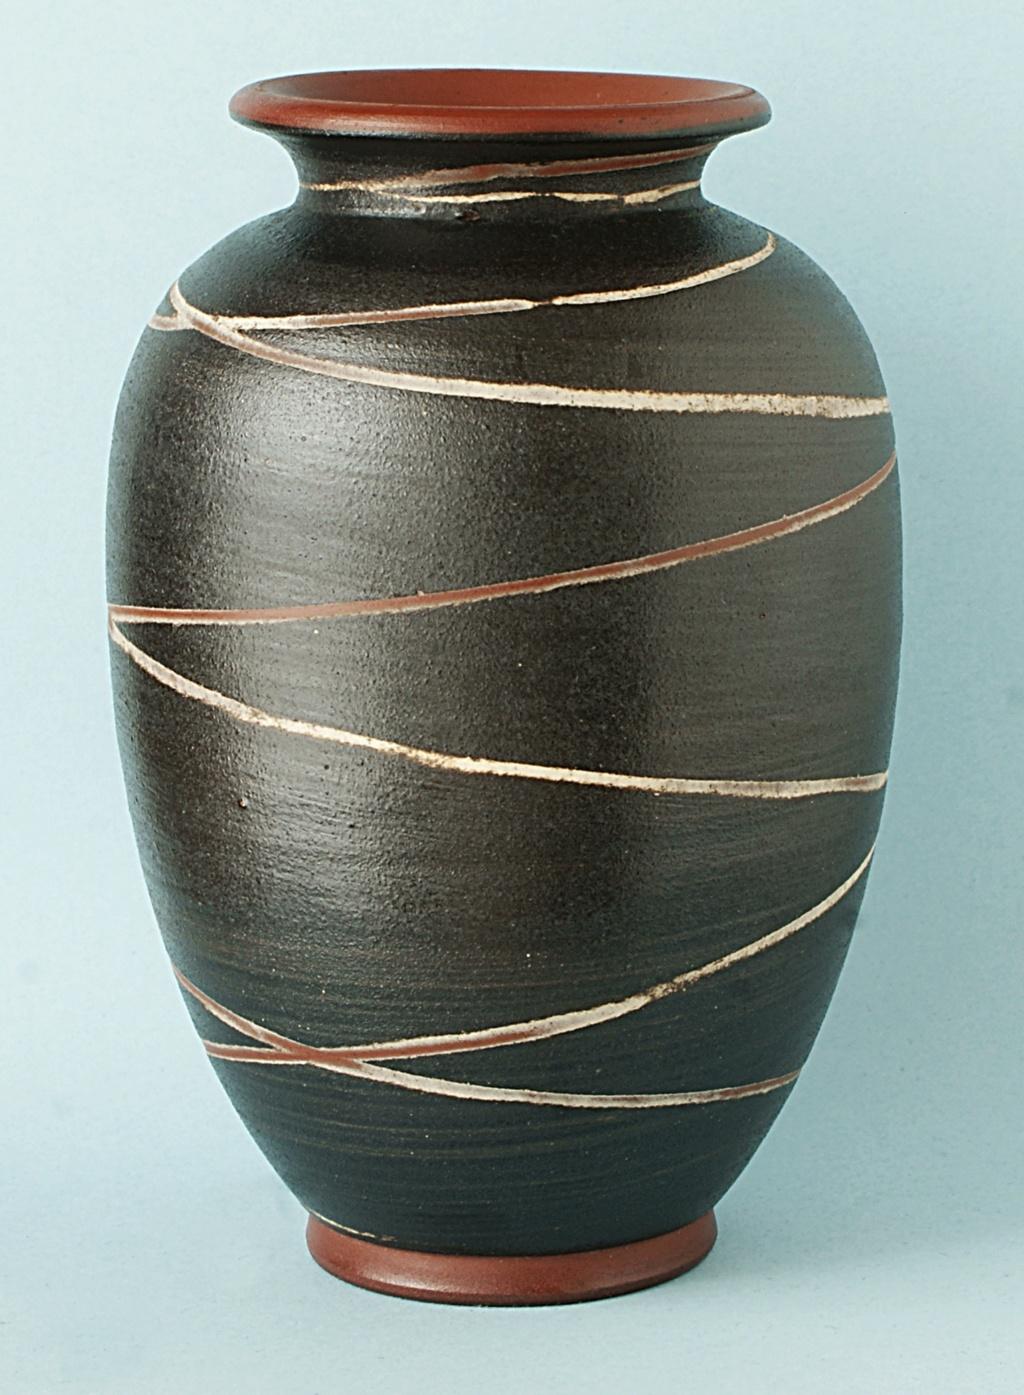 German Pottery Vase: Geseztlich Geschutz.  Dsc04810